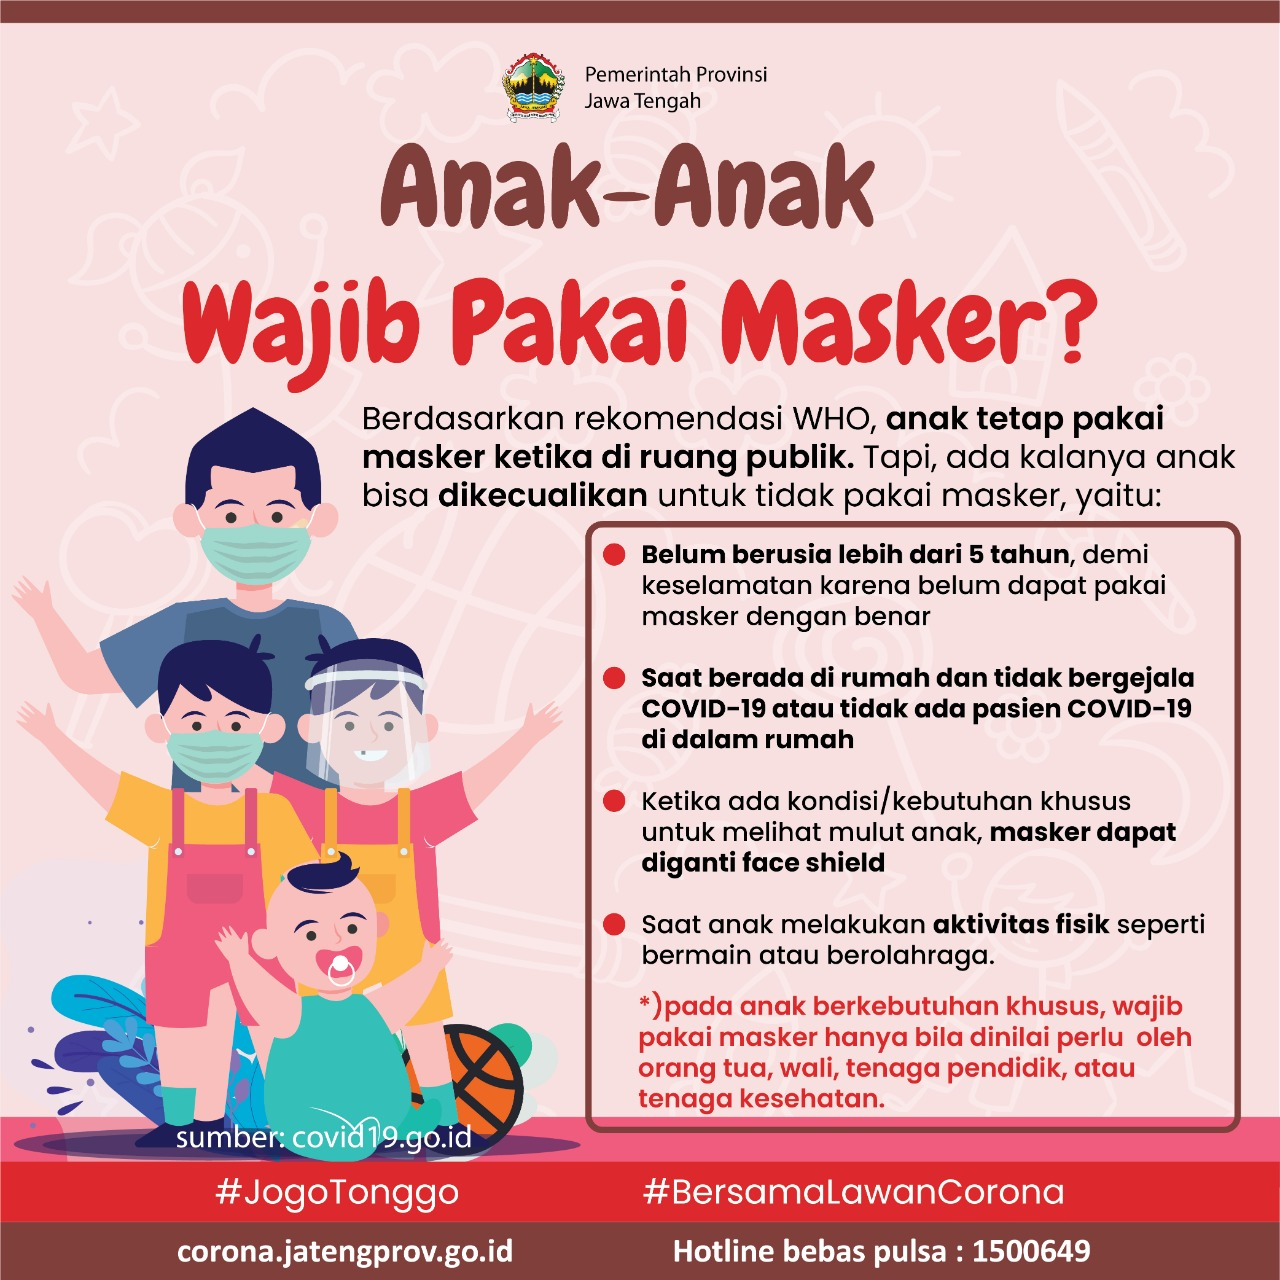 Apakah Anak-anak Wajib Pakai Masker?